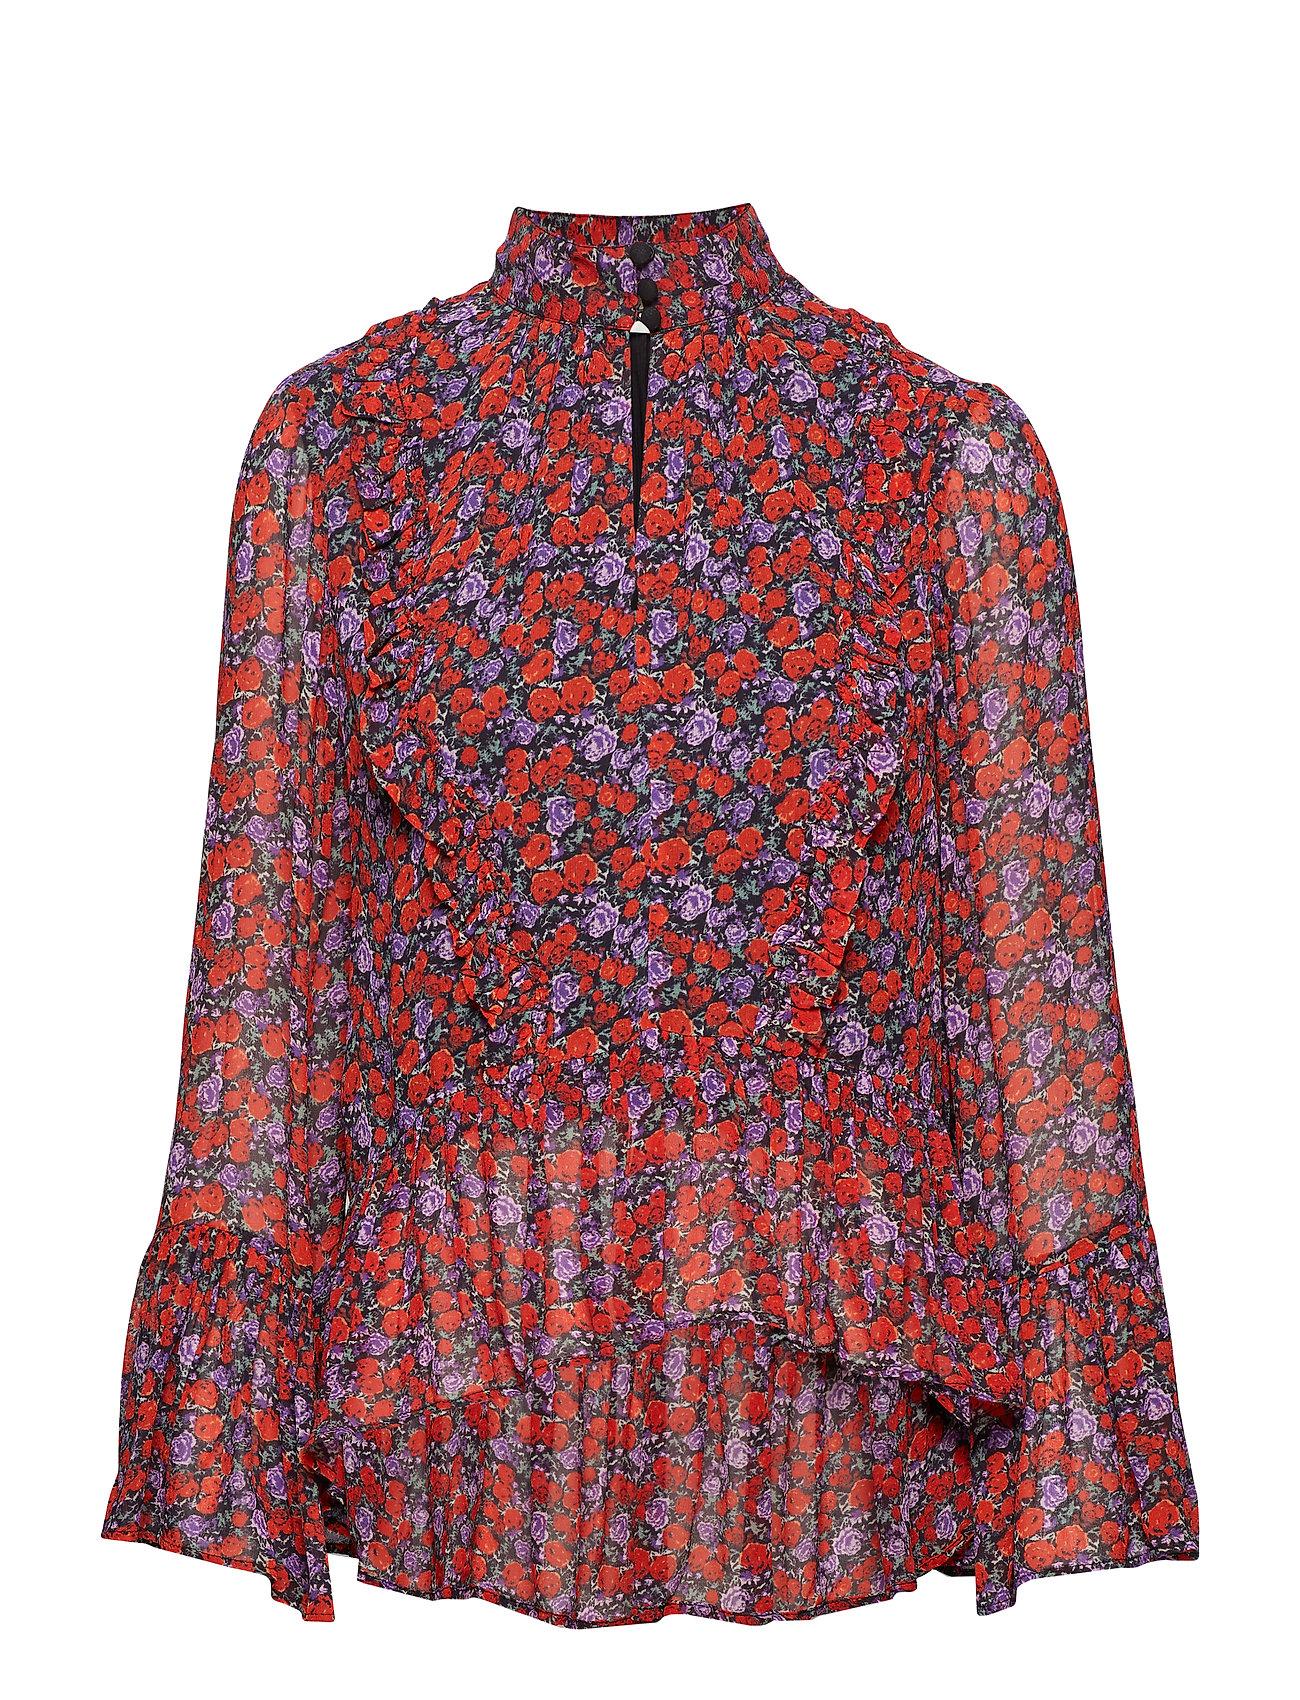 Gestuz rosanna blouse MS19 Ögrönlar